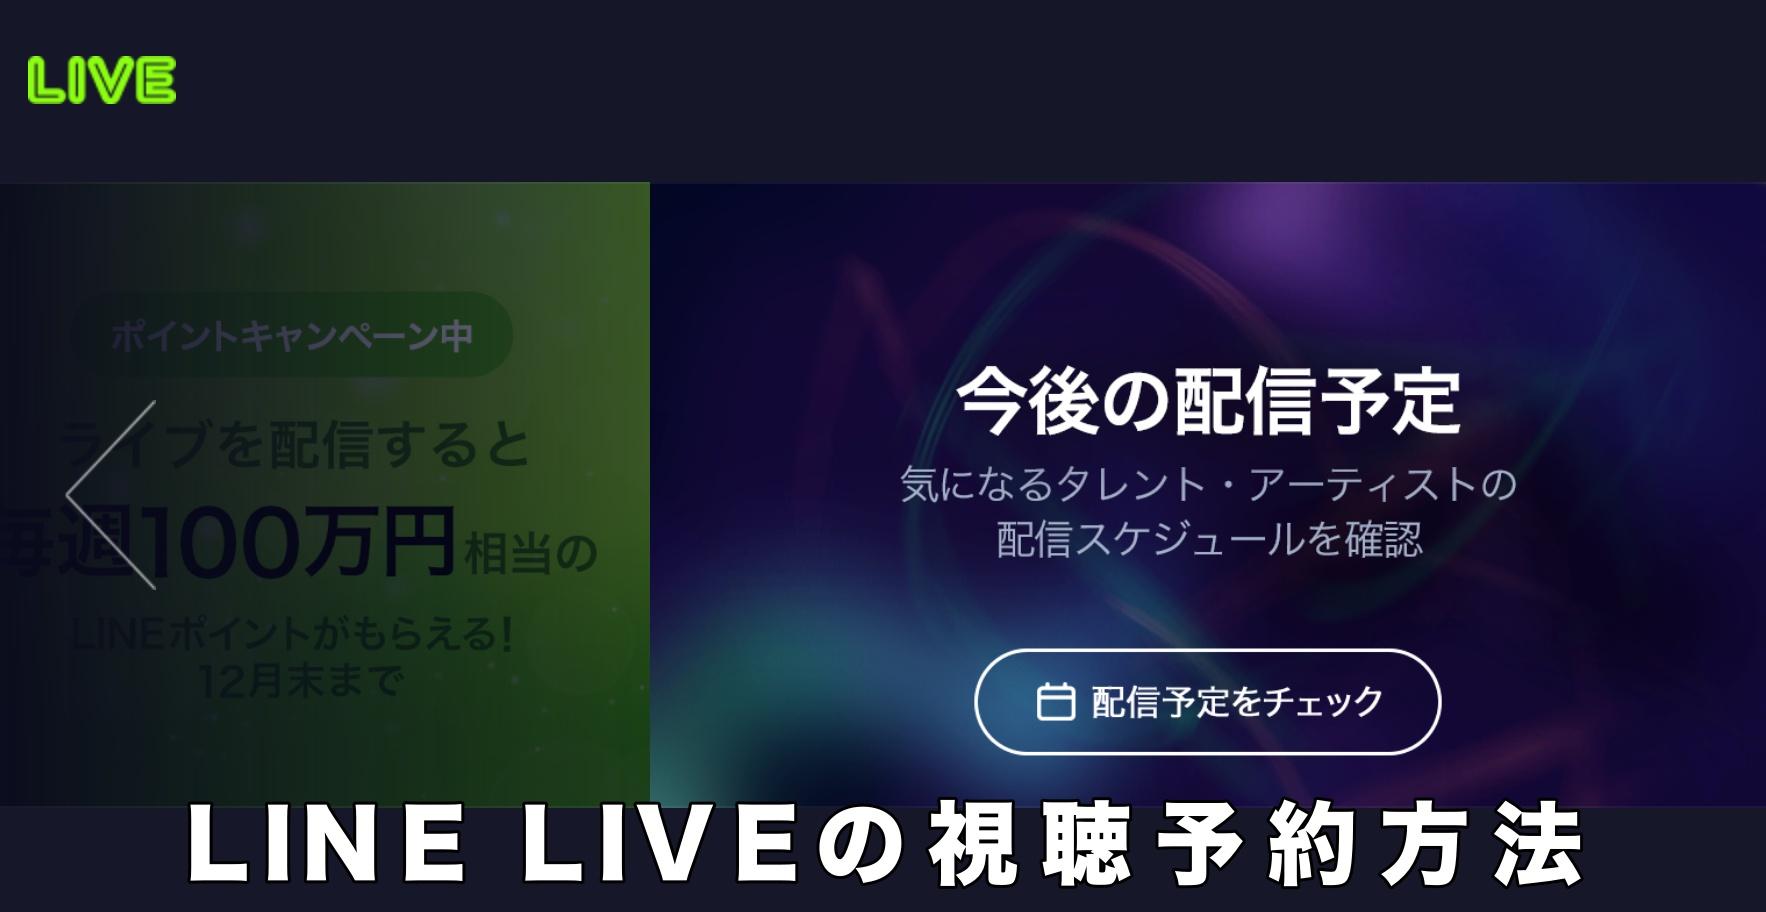 LINE LIVEの視聴予約方法を簡単に説明してみた!【iPhone編】